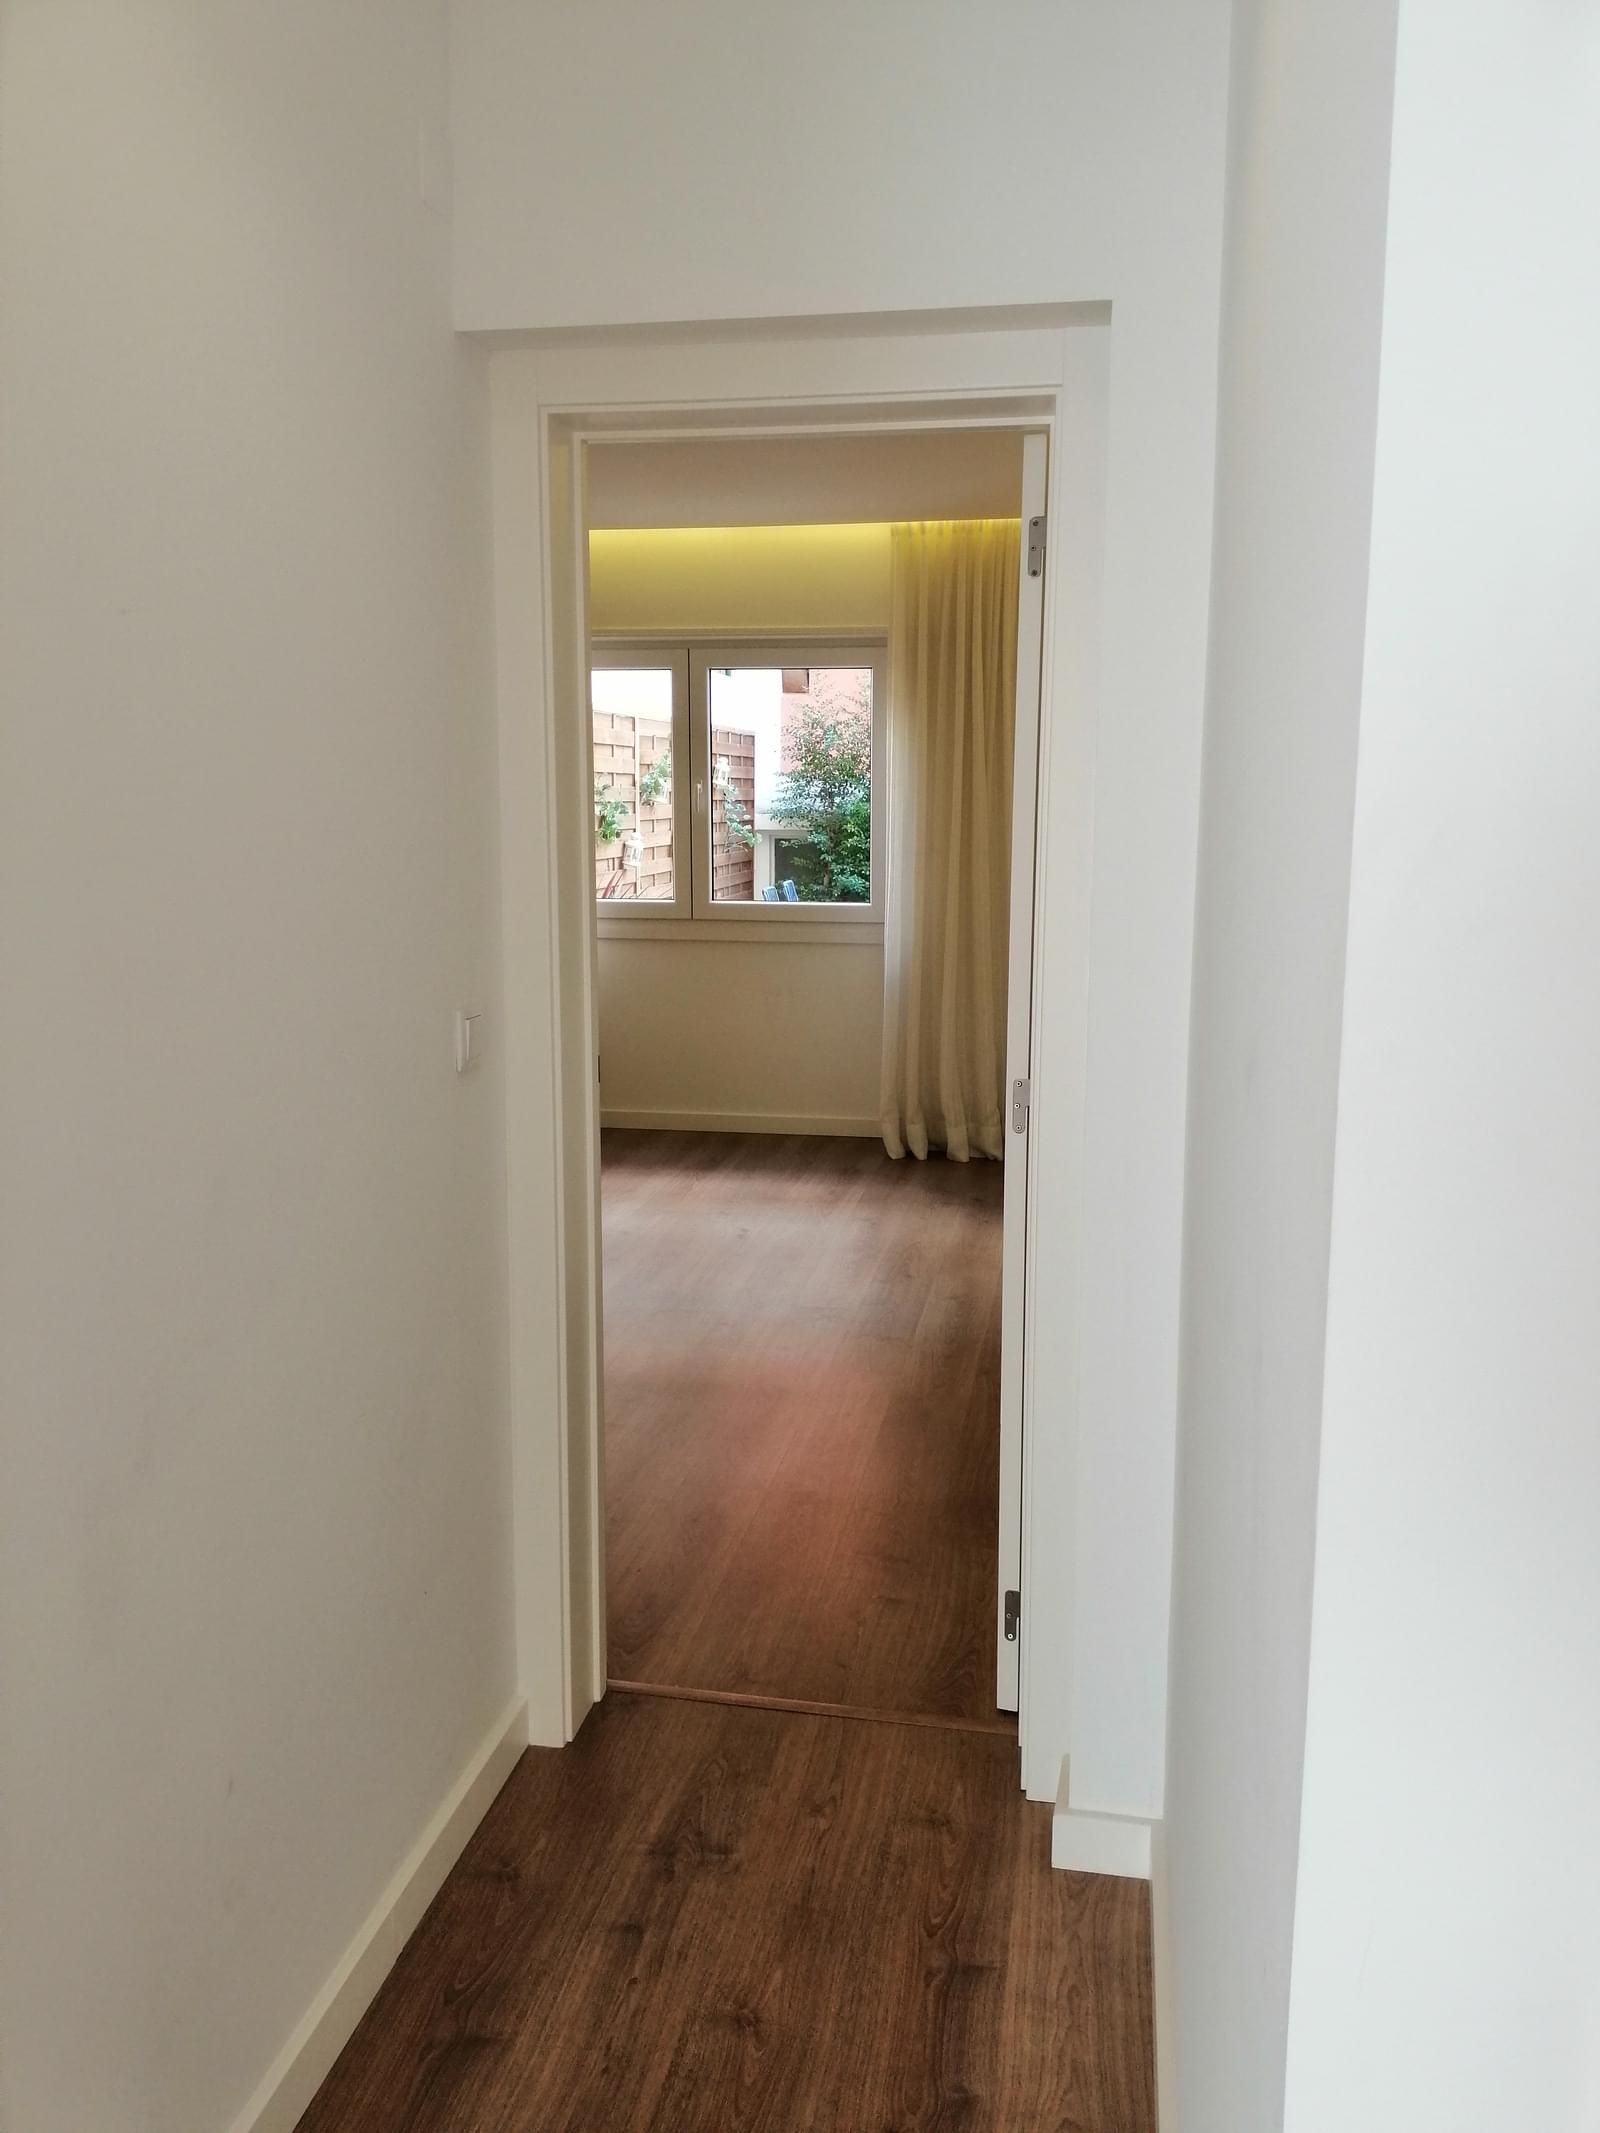 pf18996-apartamento-t3-lisboa-ba3b88af-0360-48c8-af8e-f90ae7e599cb